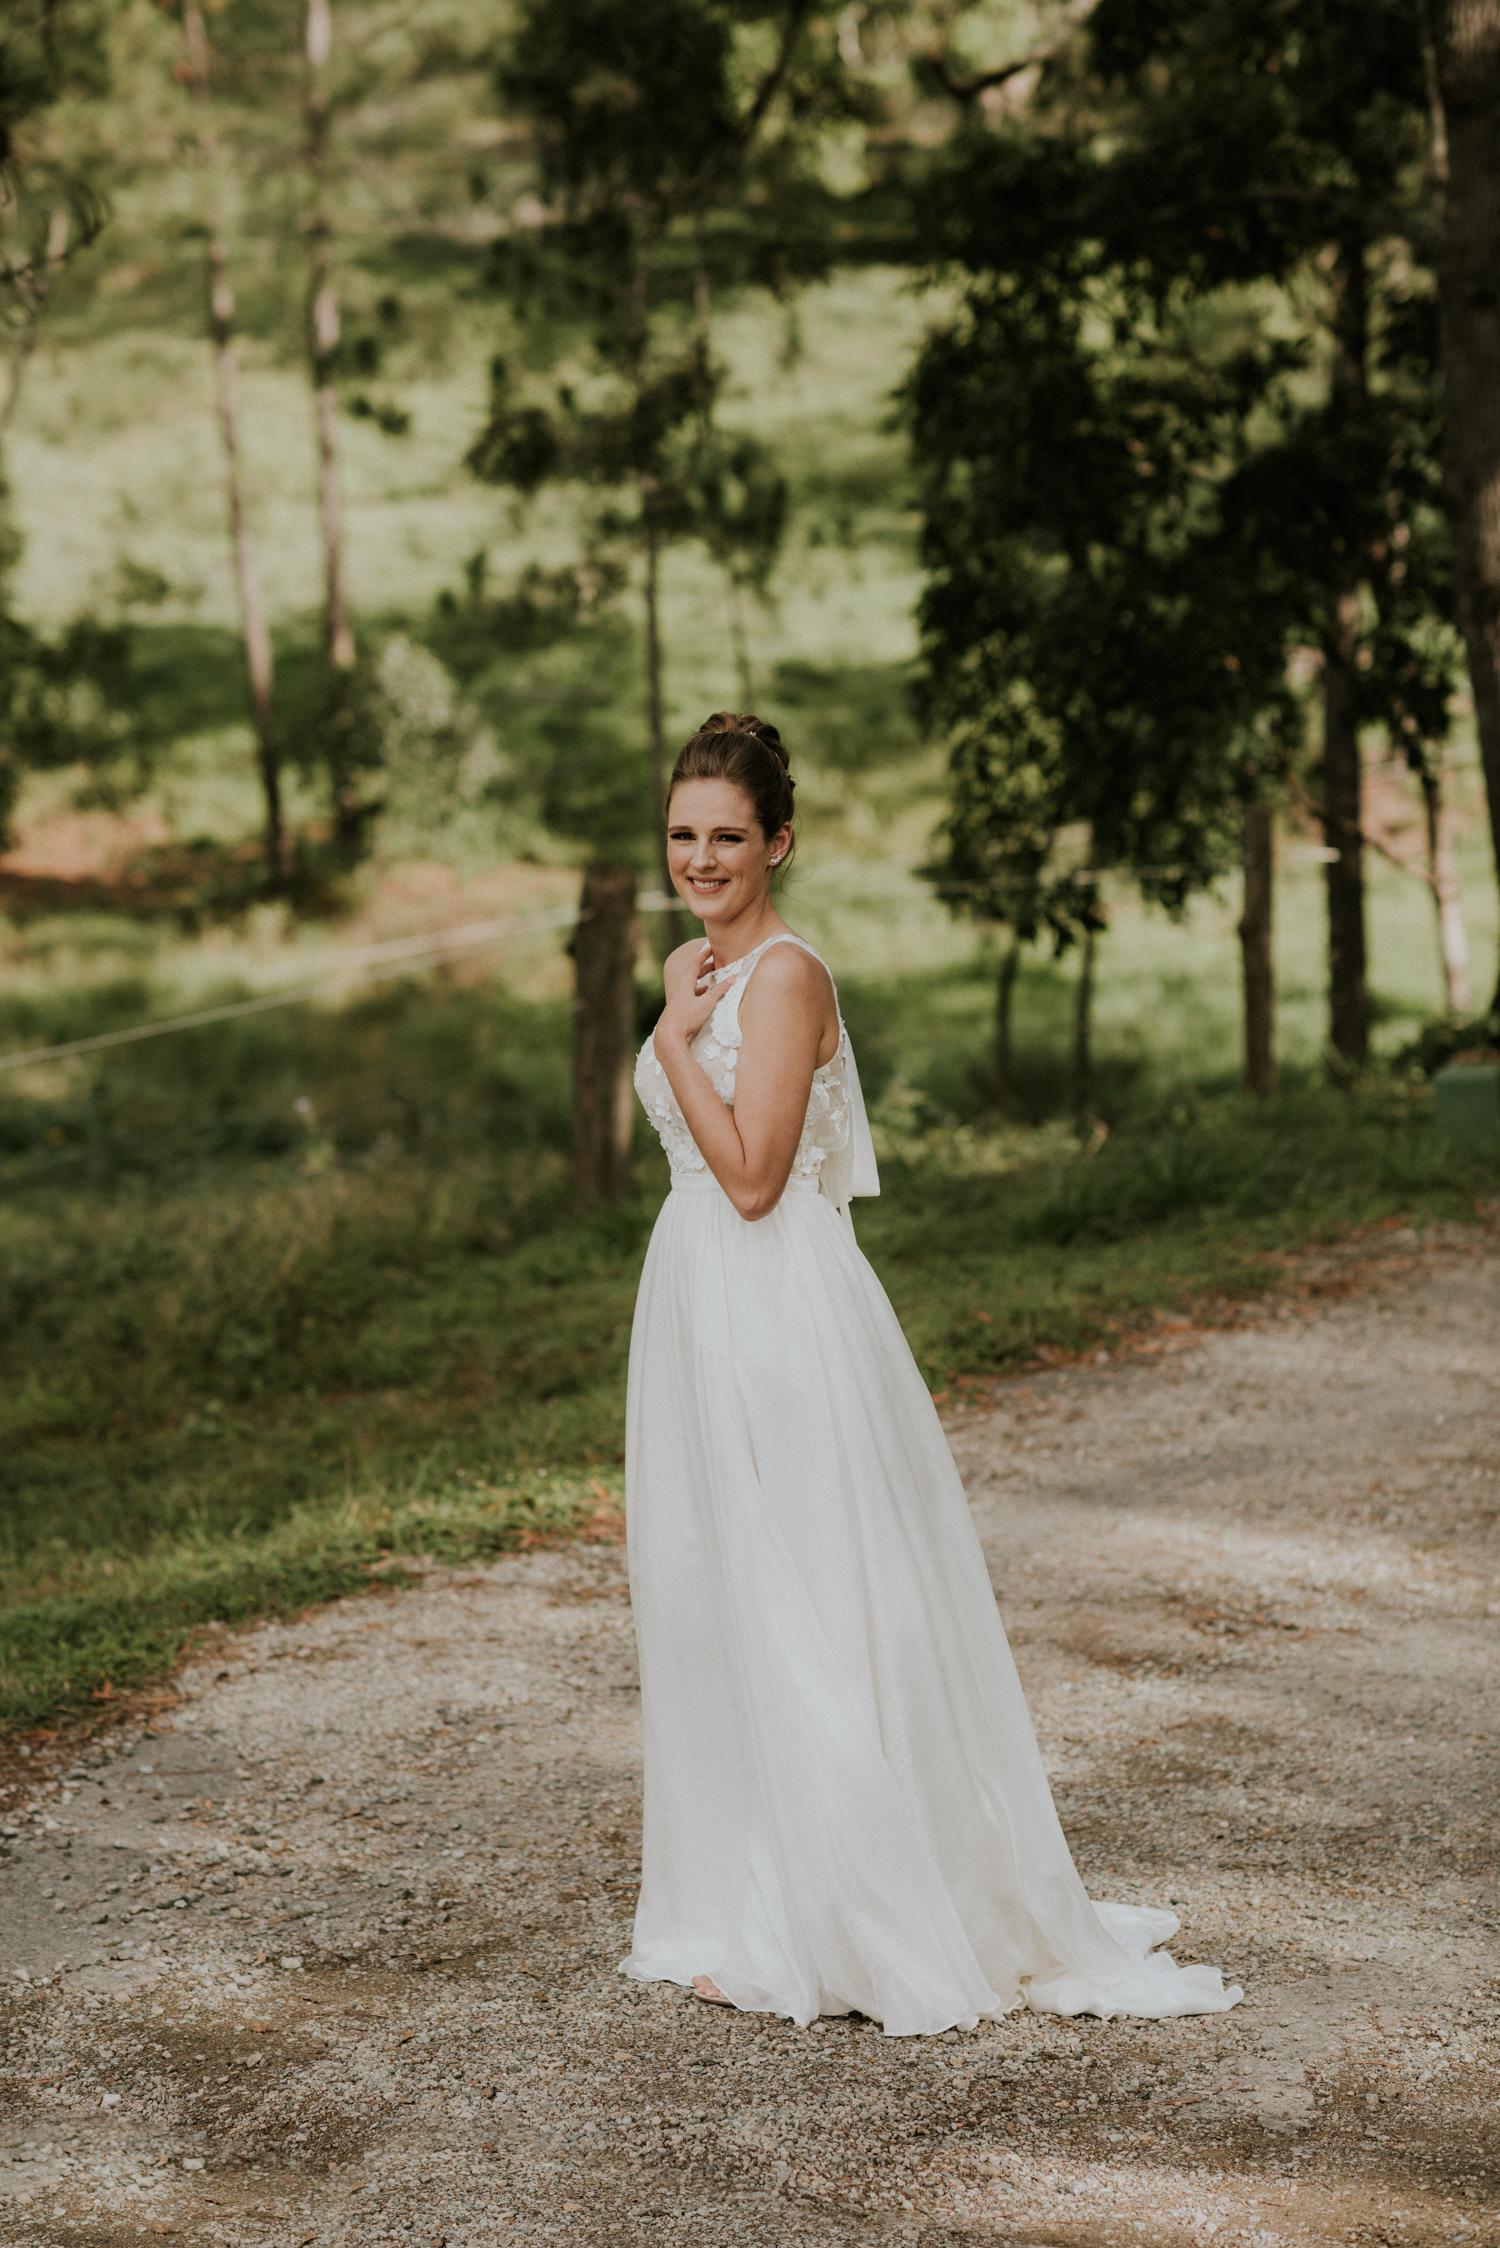 Brisbane Wedding Photographer | Bundaleer Rainforest Gardens Elopement Photography-25.jpg